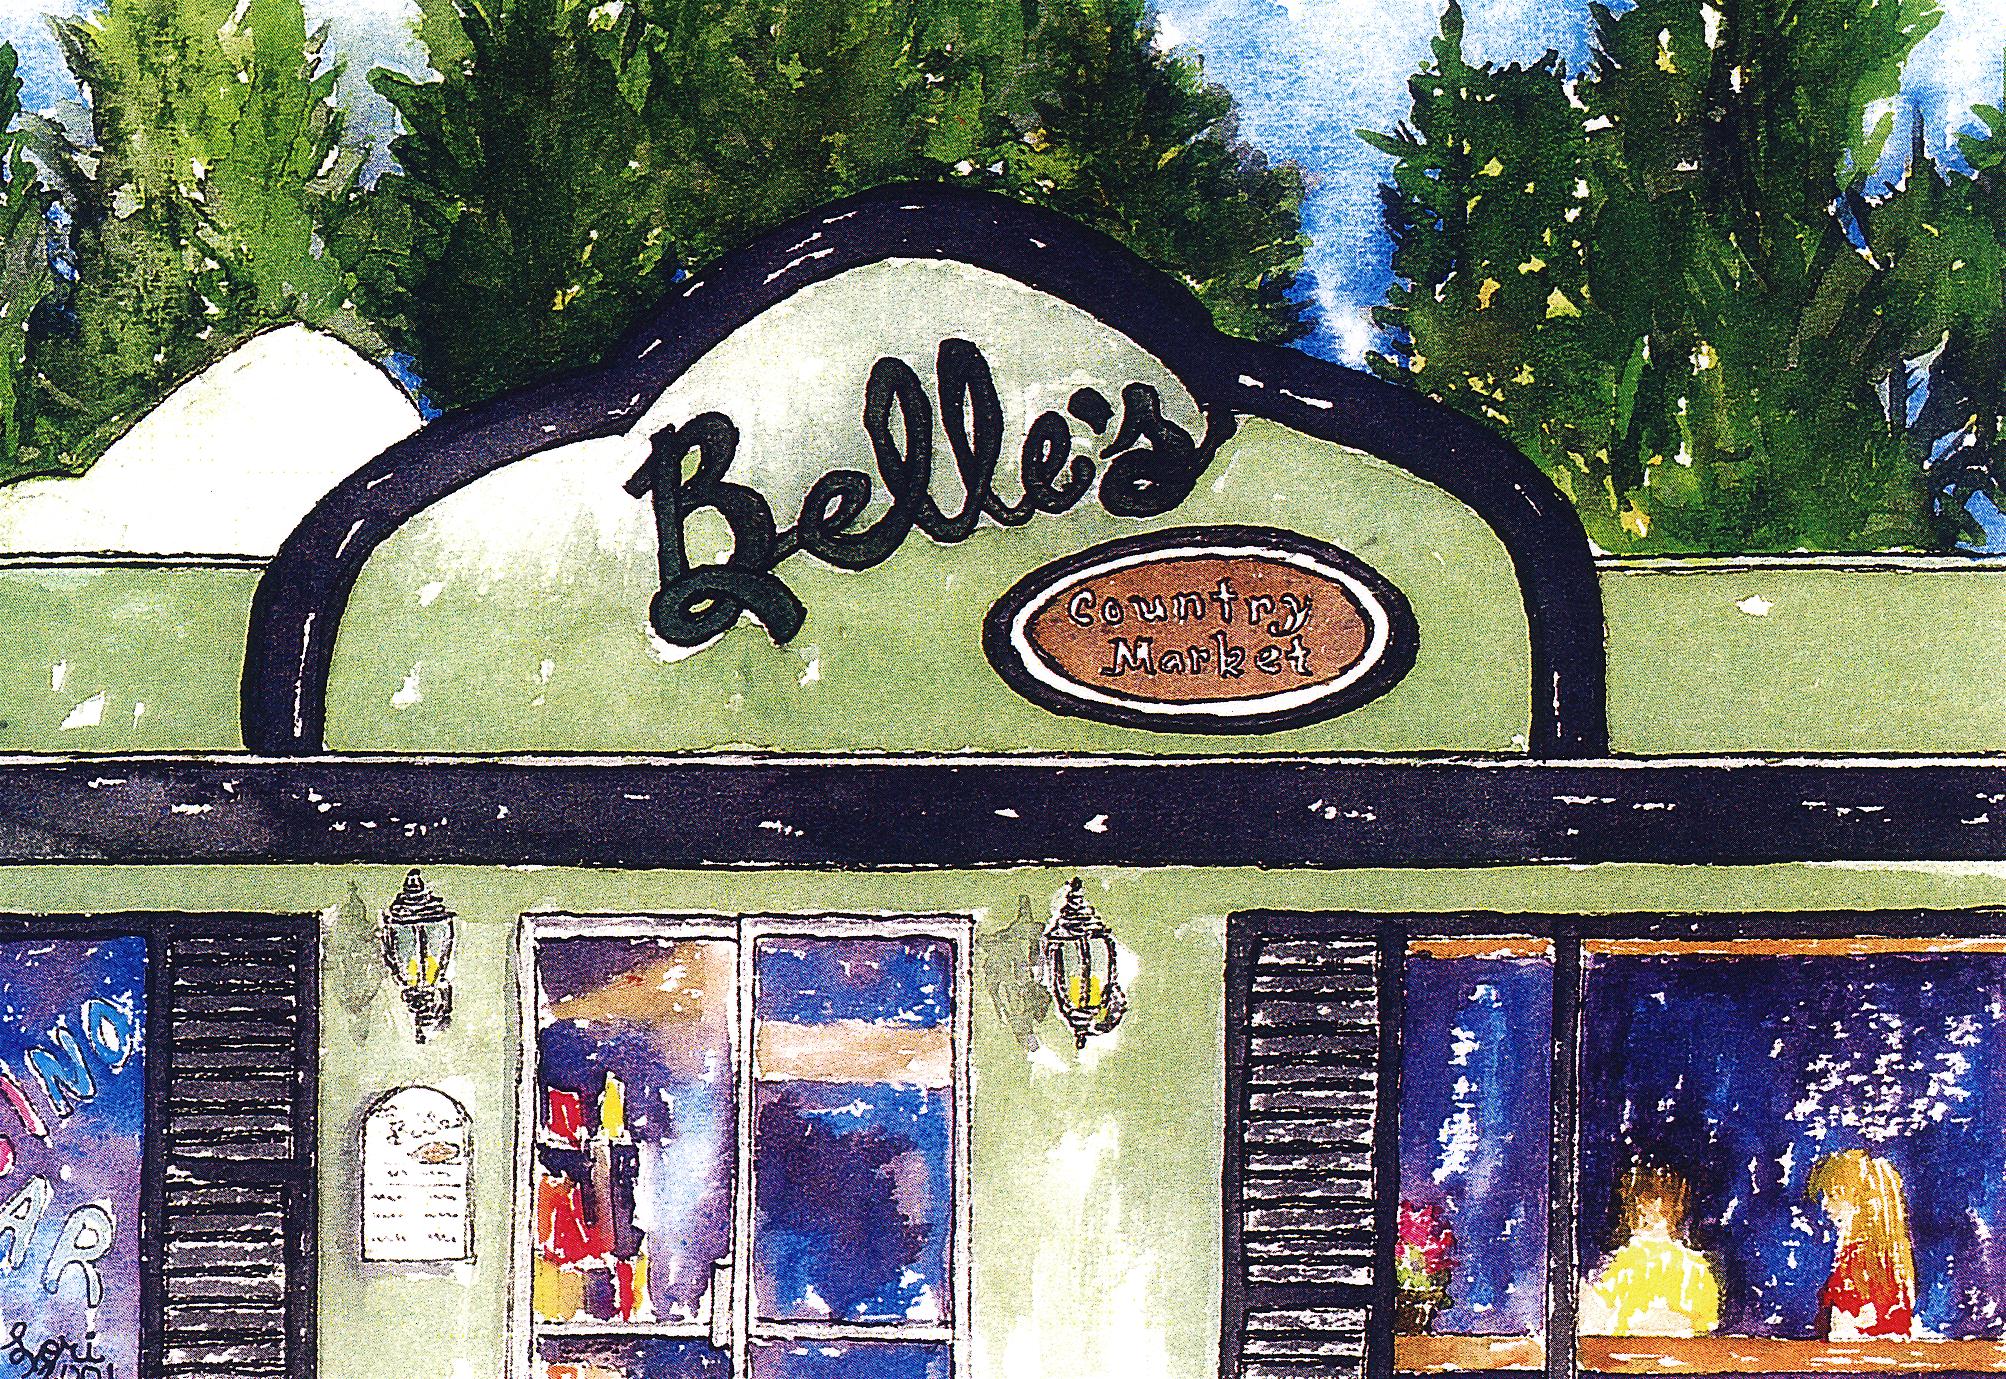 Belle's